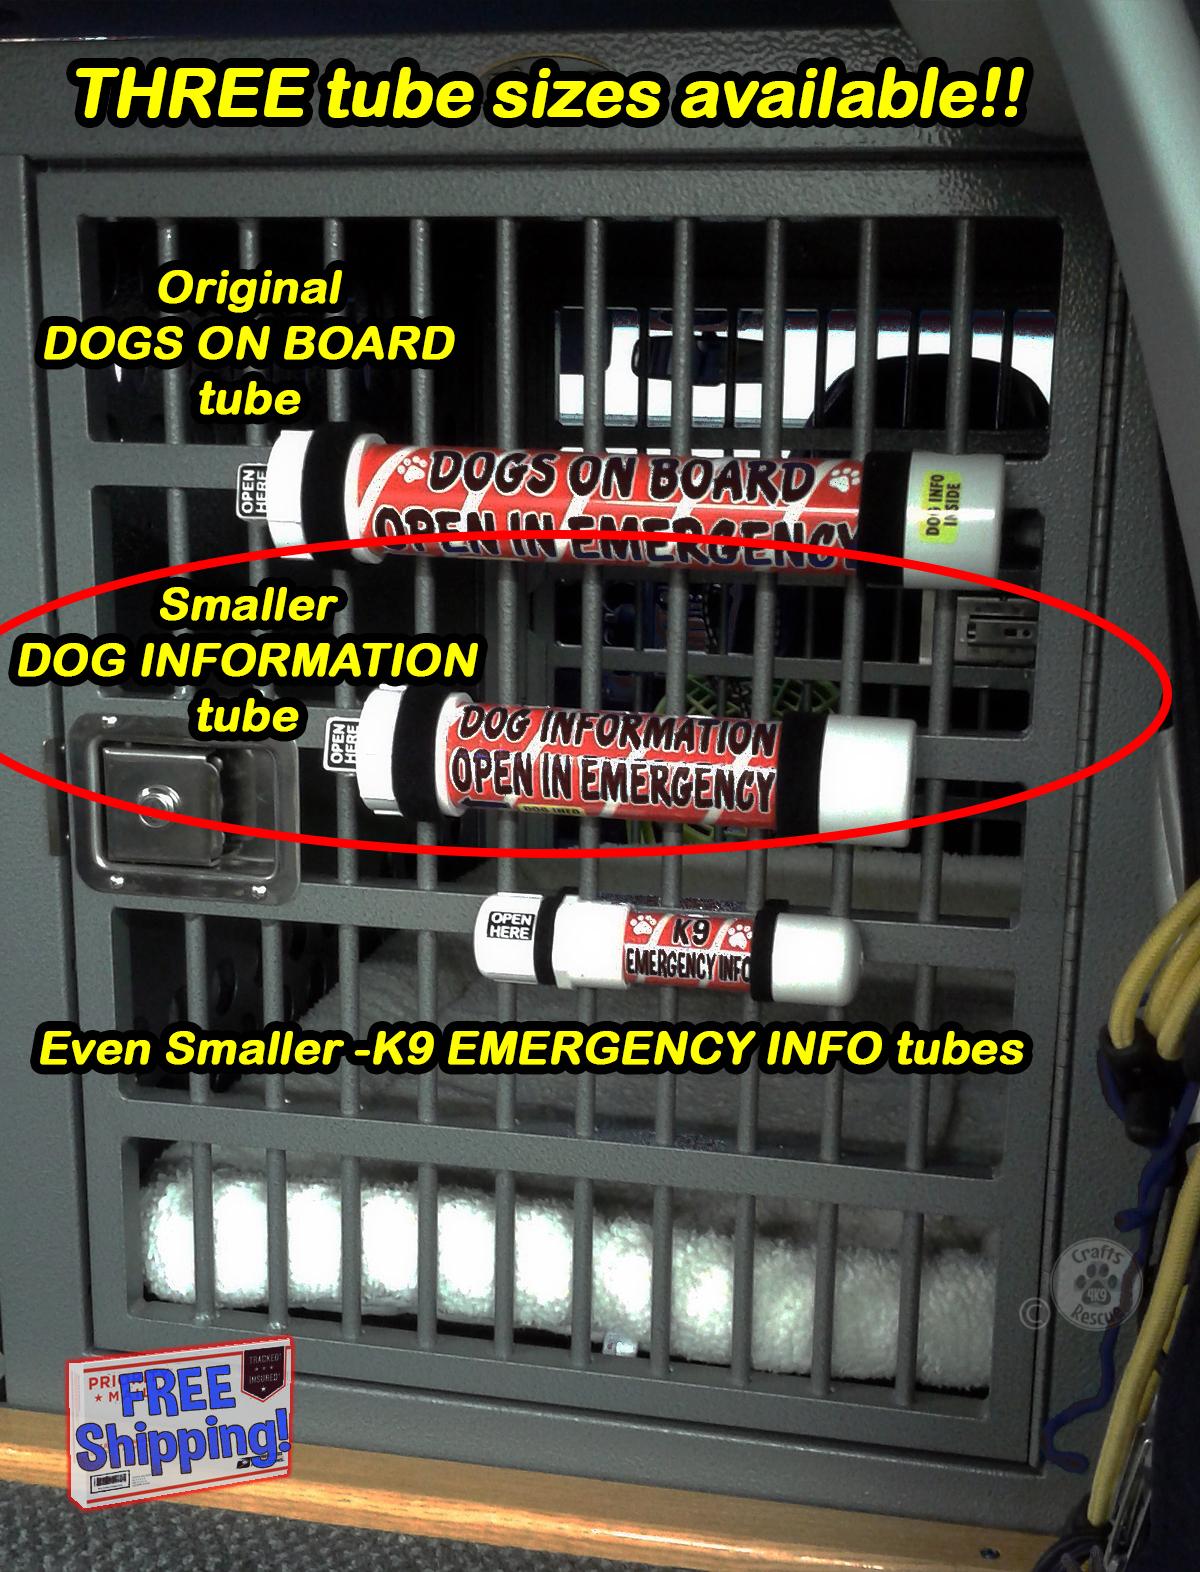 10-inch DOG INFORMATION - OPEN IN | Crafts4K9Rescue